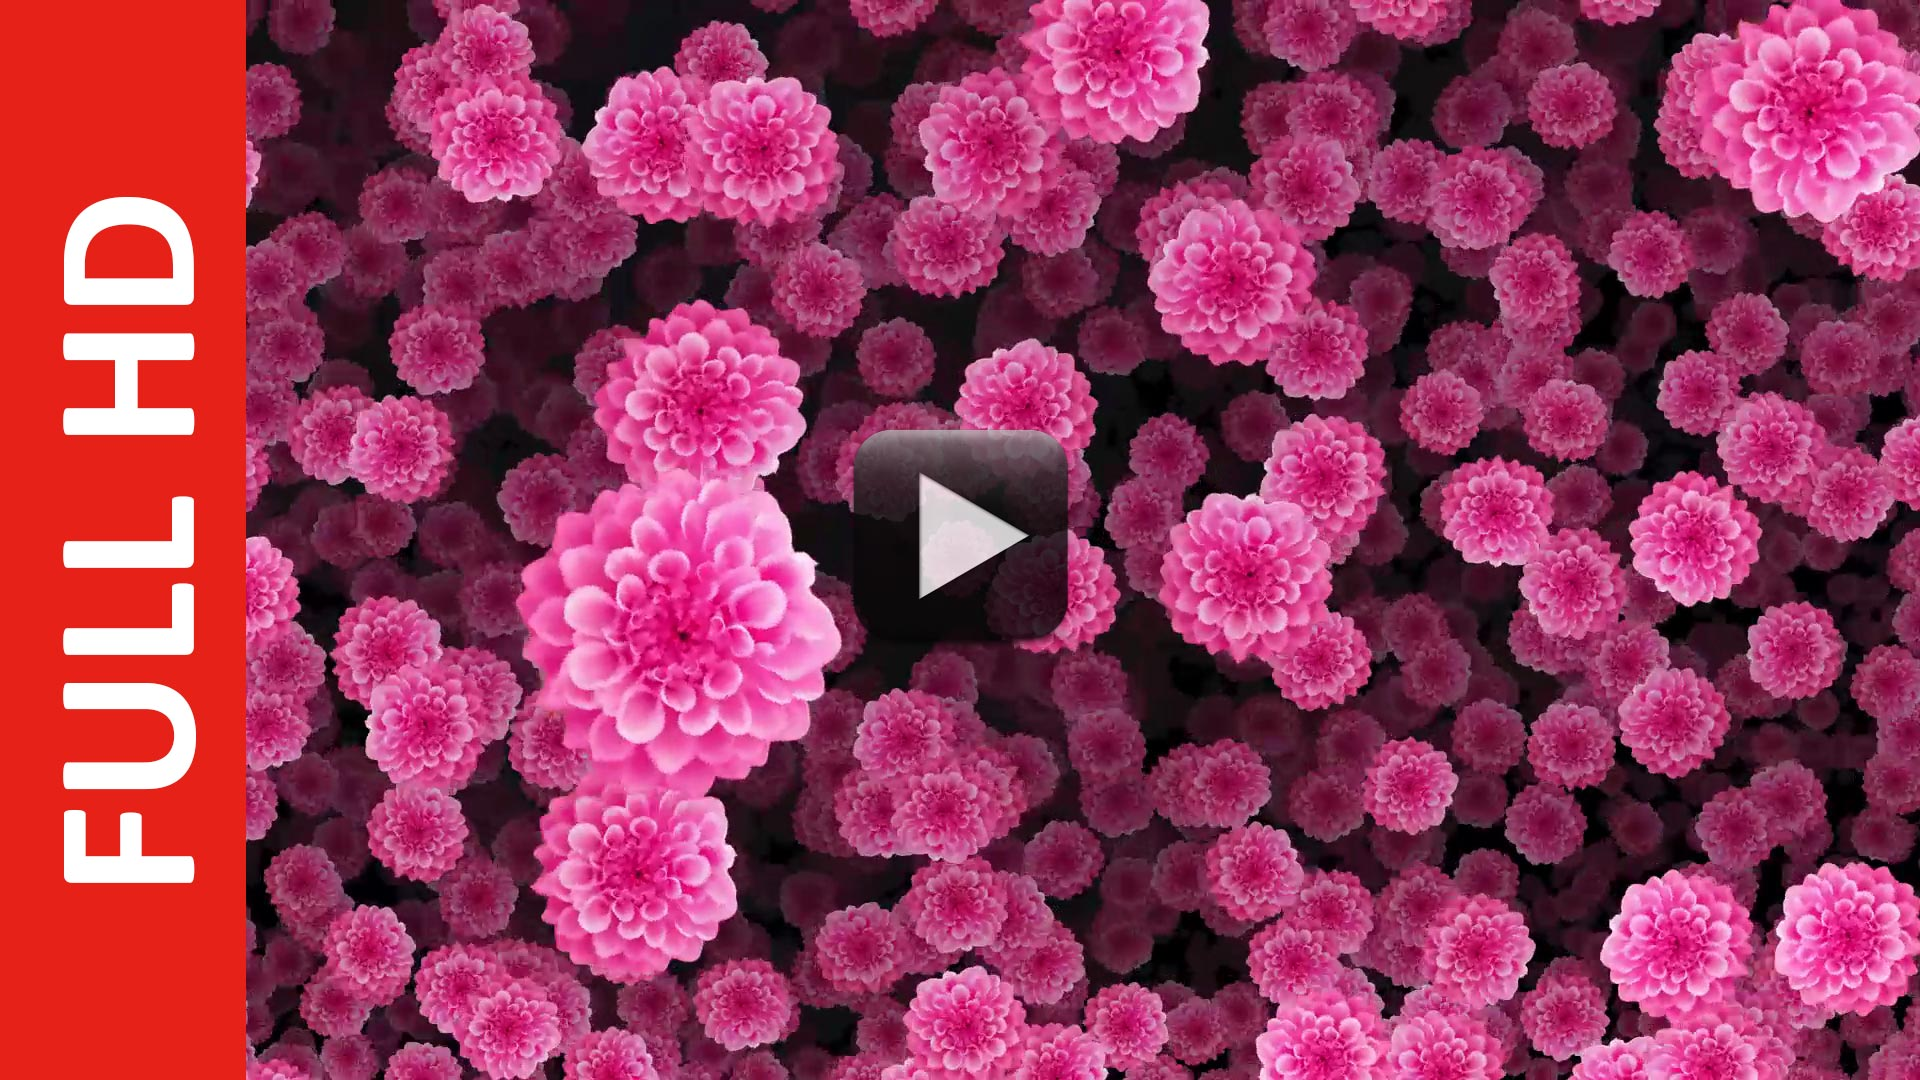 Rose Pink Flowers Animation Falling